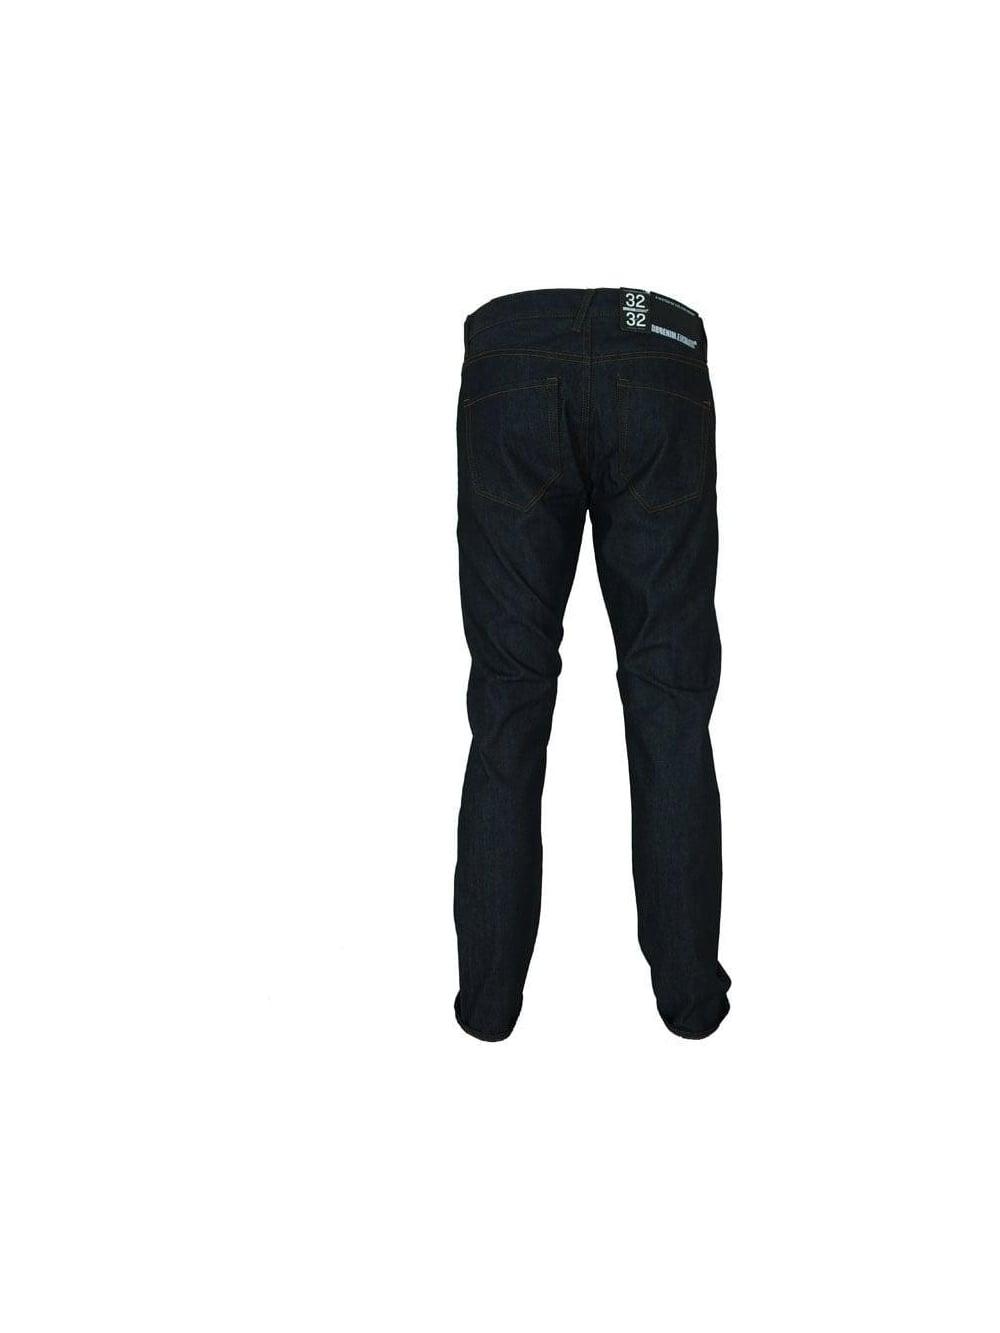 cd4047d2 Dr Denim Raymond Regular Straight Jeans in Black/Blue - Shop Dr ...